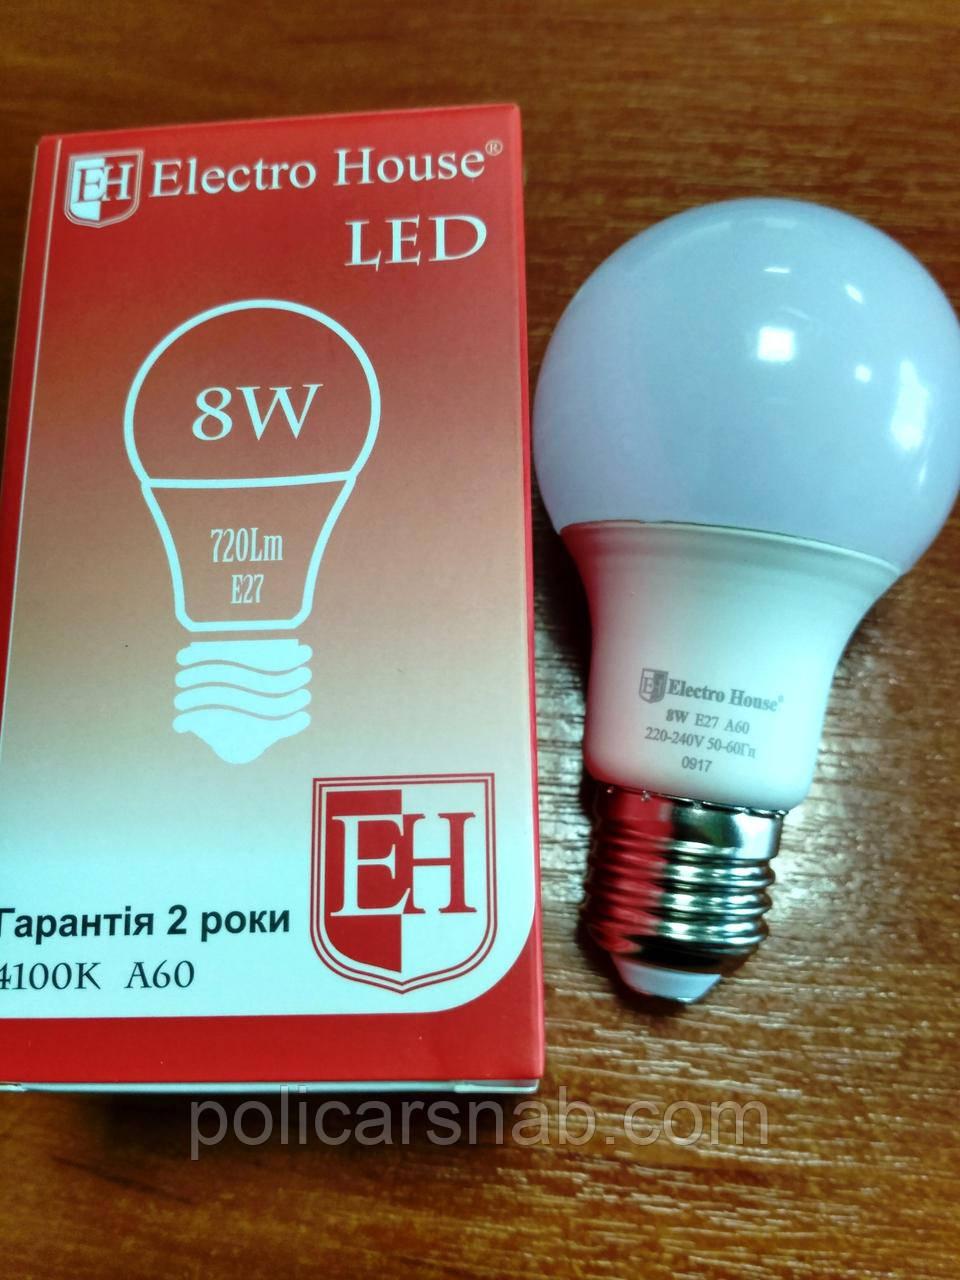 Лампа Electro House светодиодная 8W 720Lm Е27 шар